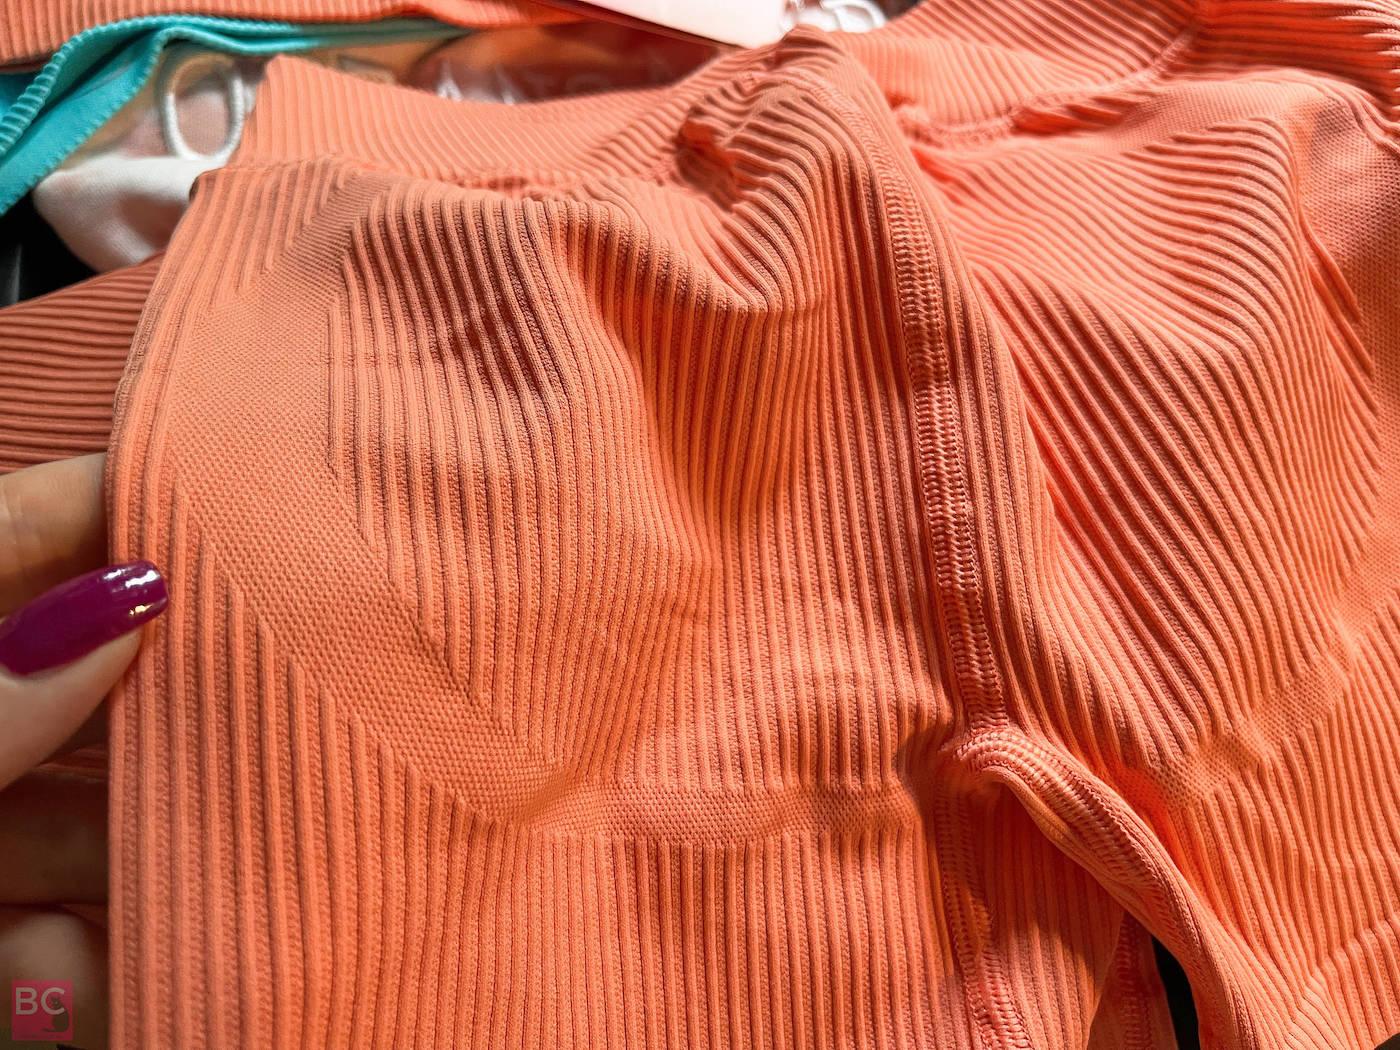 HOTPANTS PANTS Team Harrison Oceans Apart Collection Orange Blooming Summmer Set